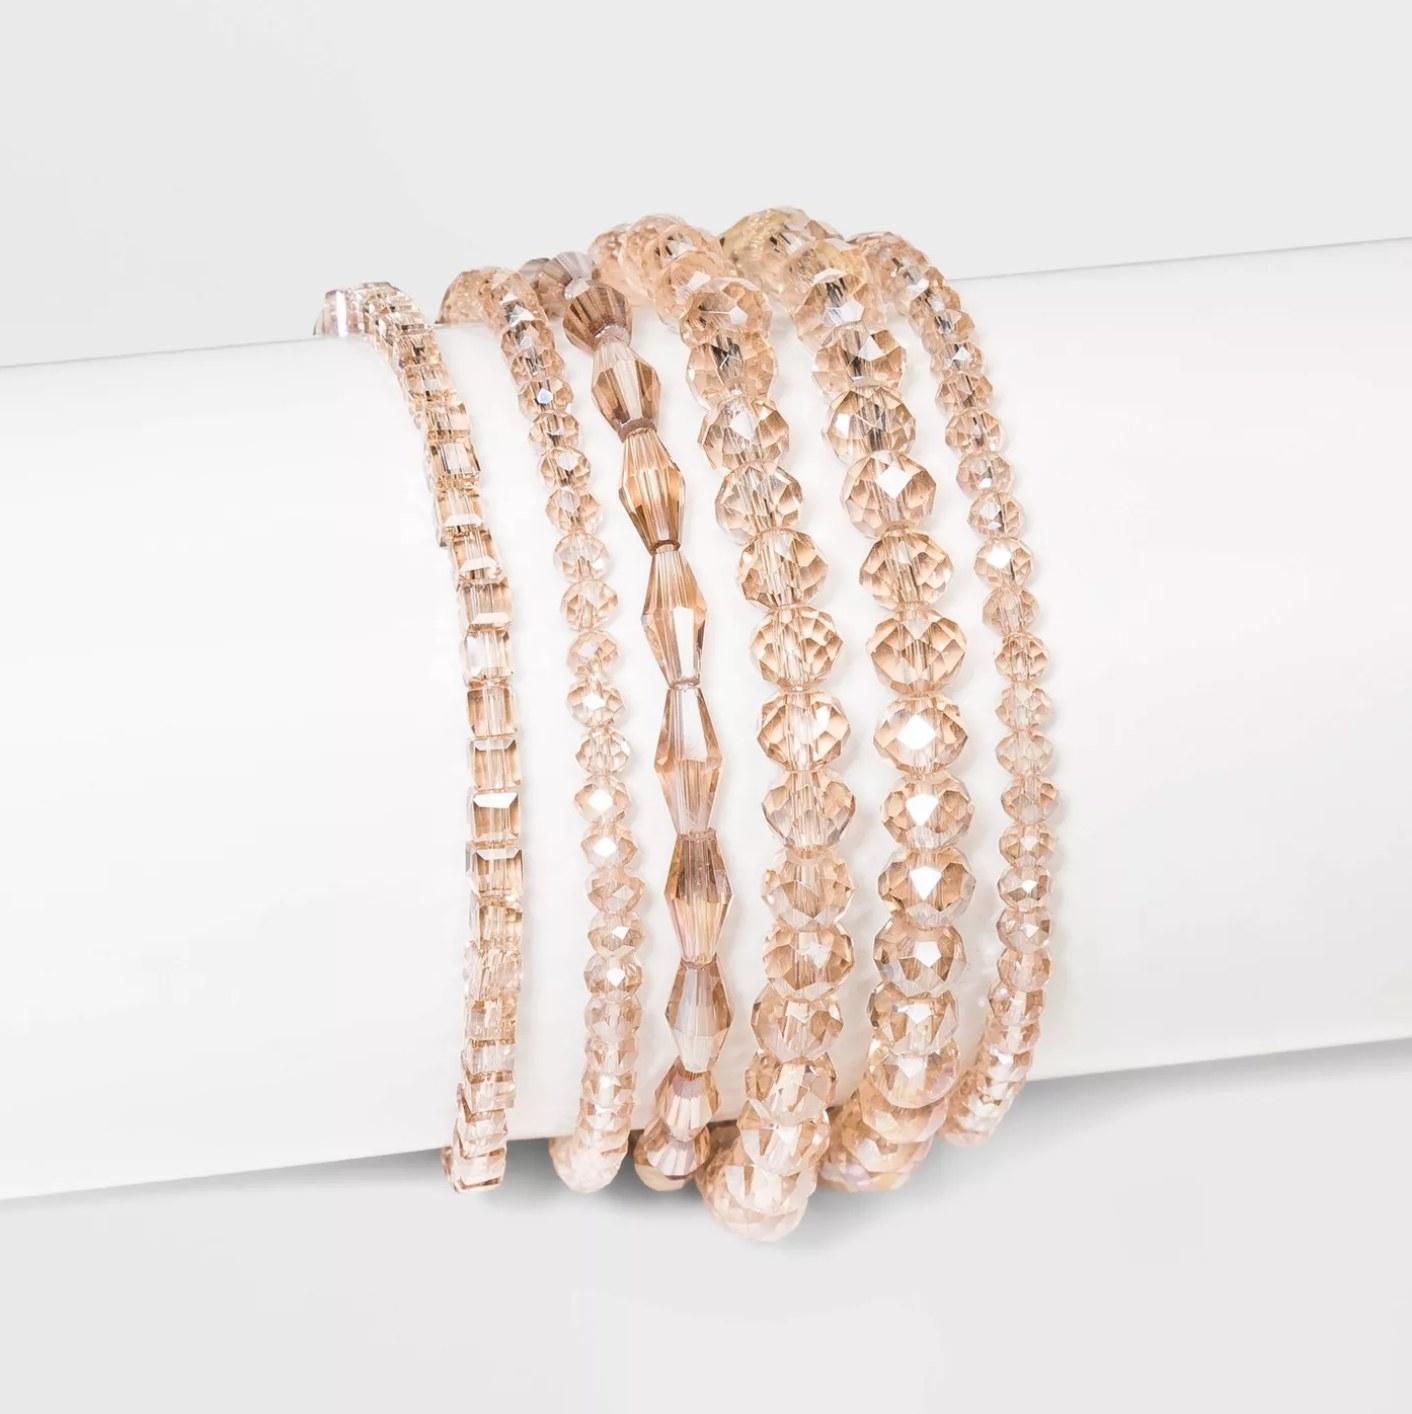 The rose gold bracelet